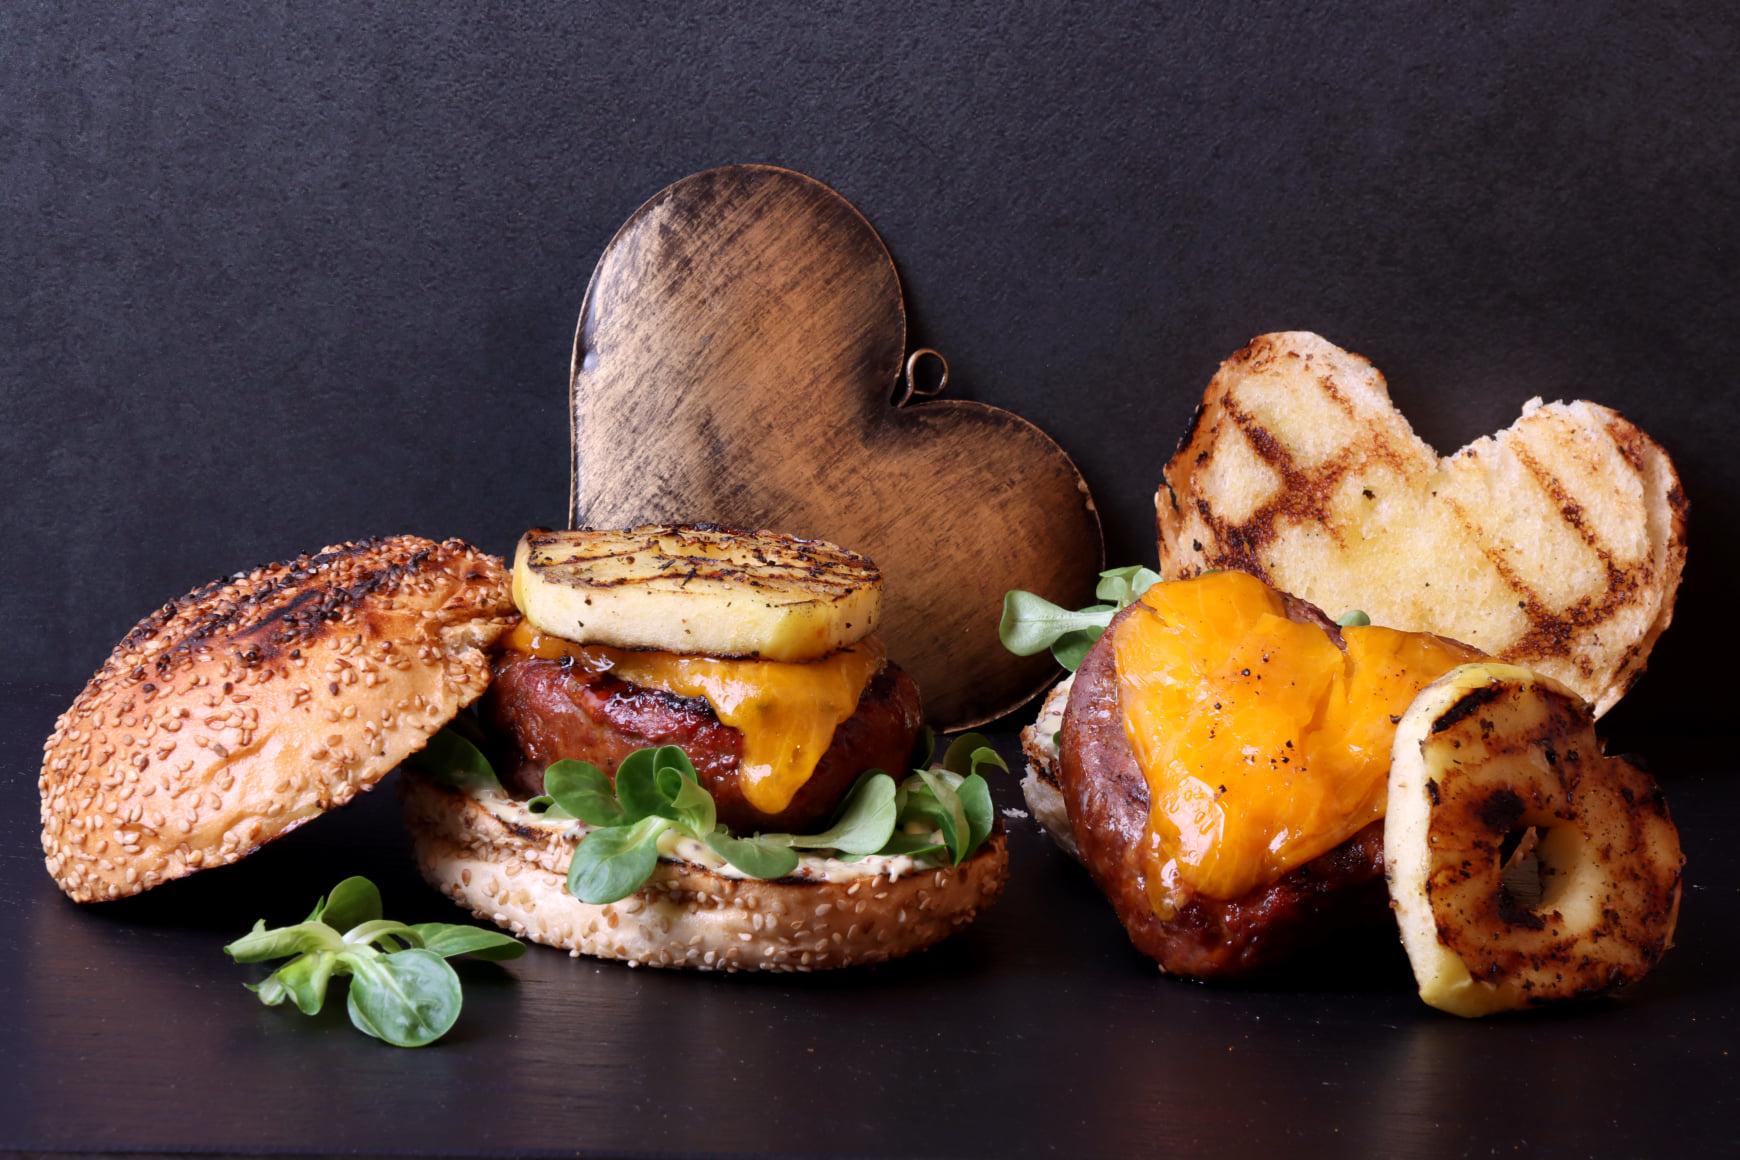 The LOVE burger - Spread the love